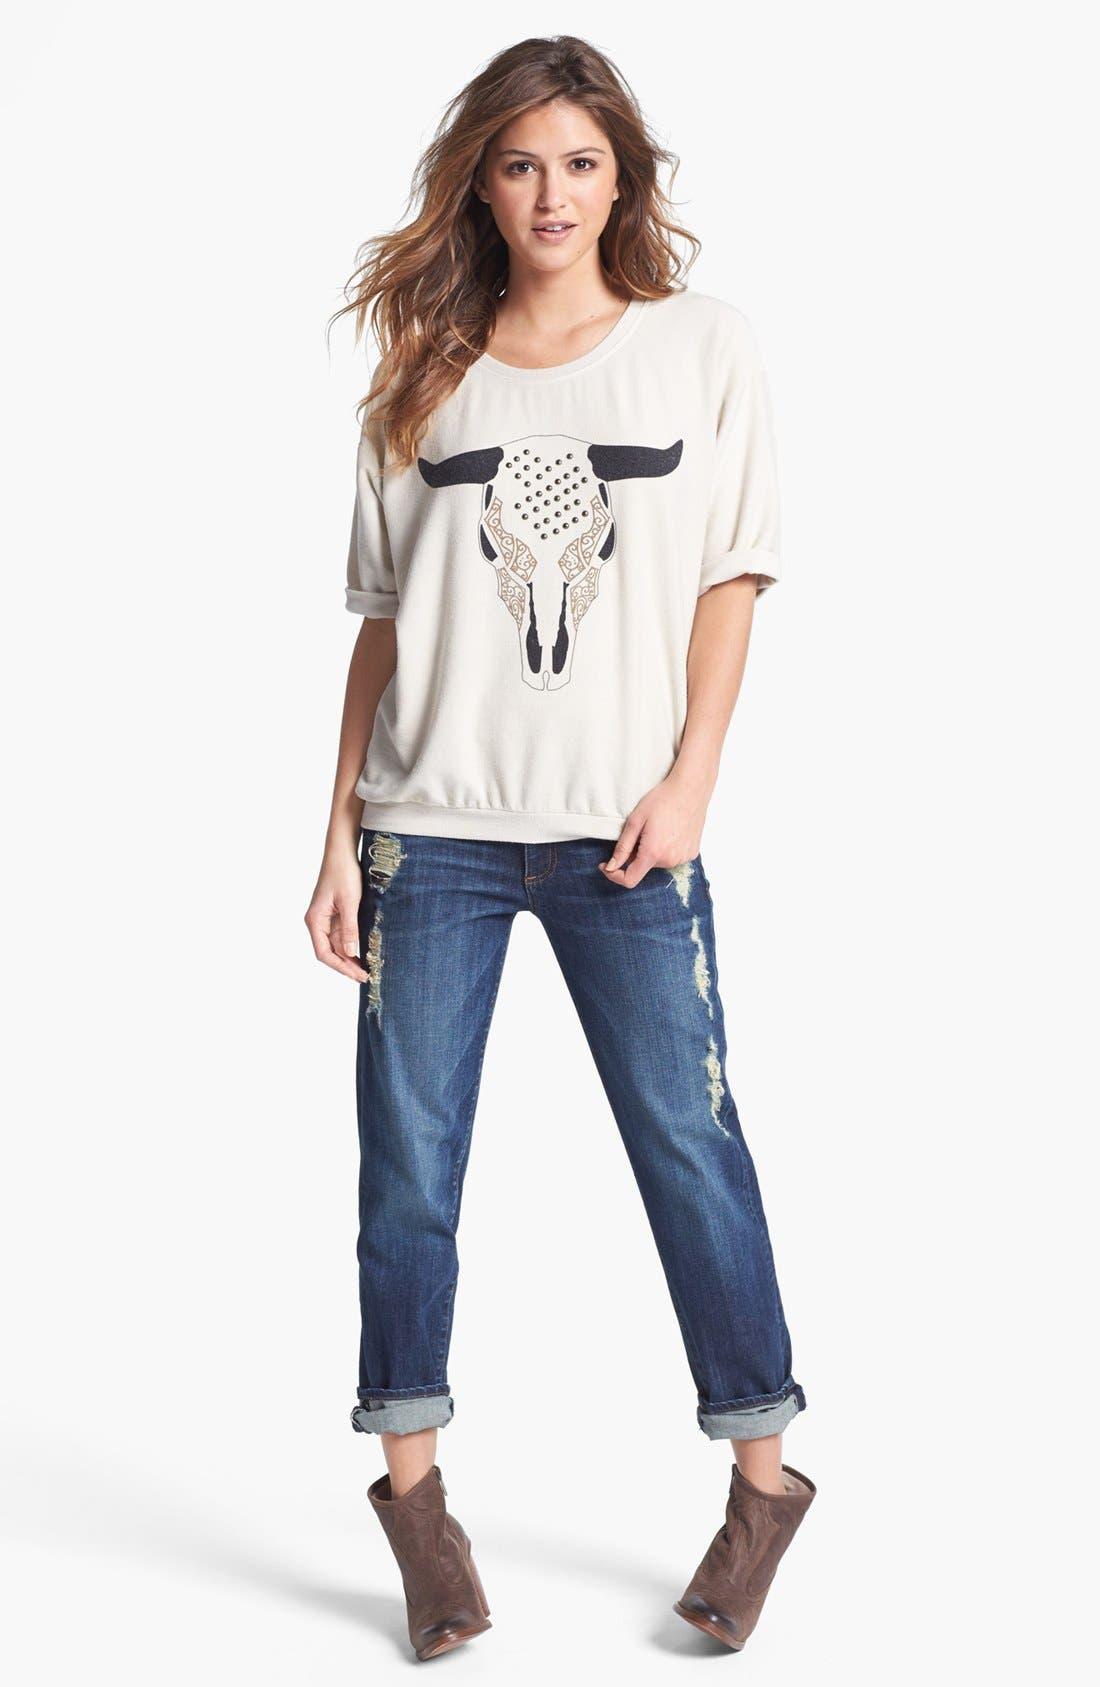 Alternate Image 1 Selected - Max & Mia Sweatshirt & KUT from the Kloth Boyfriend Jeans